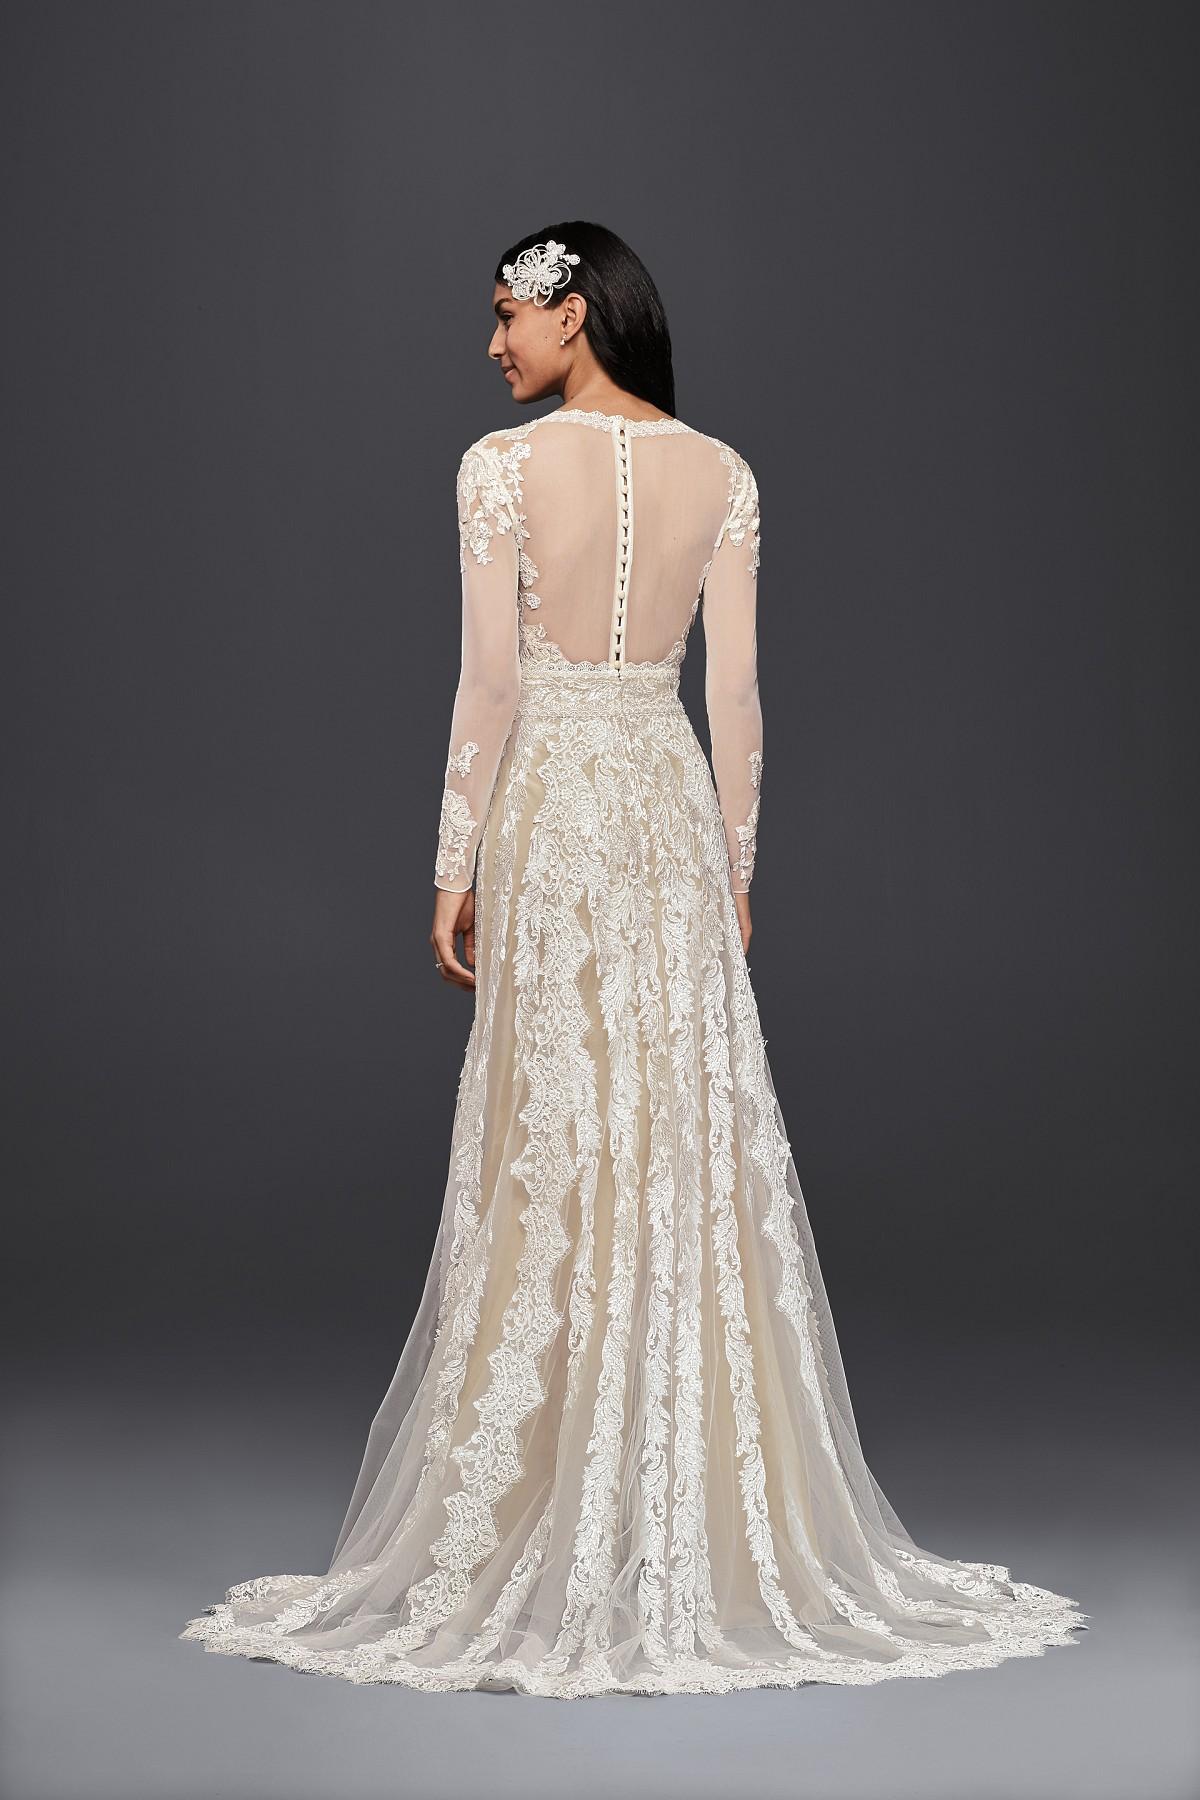 Fall 16 Wedding Dresses with David's Bridal